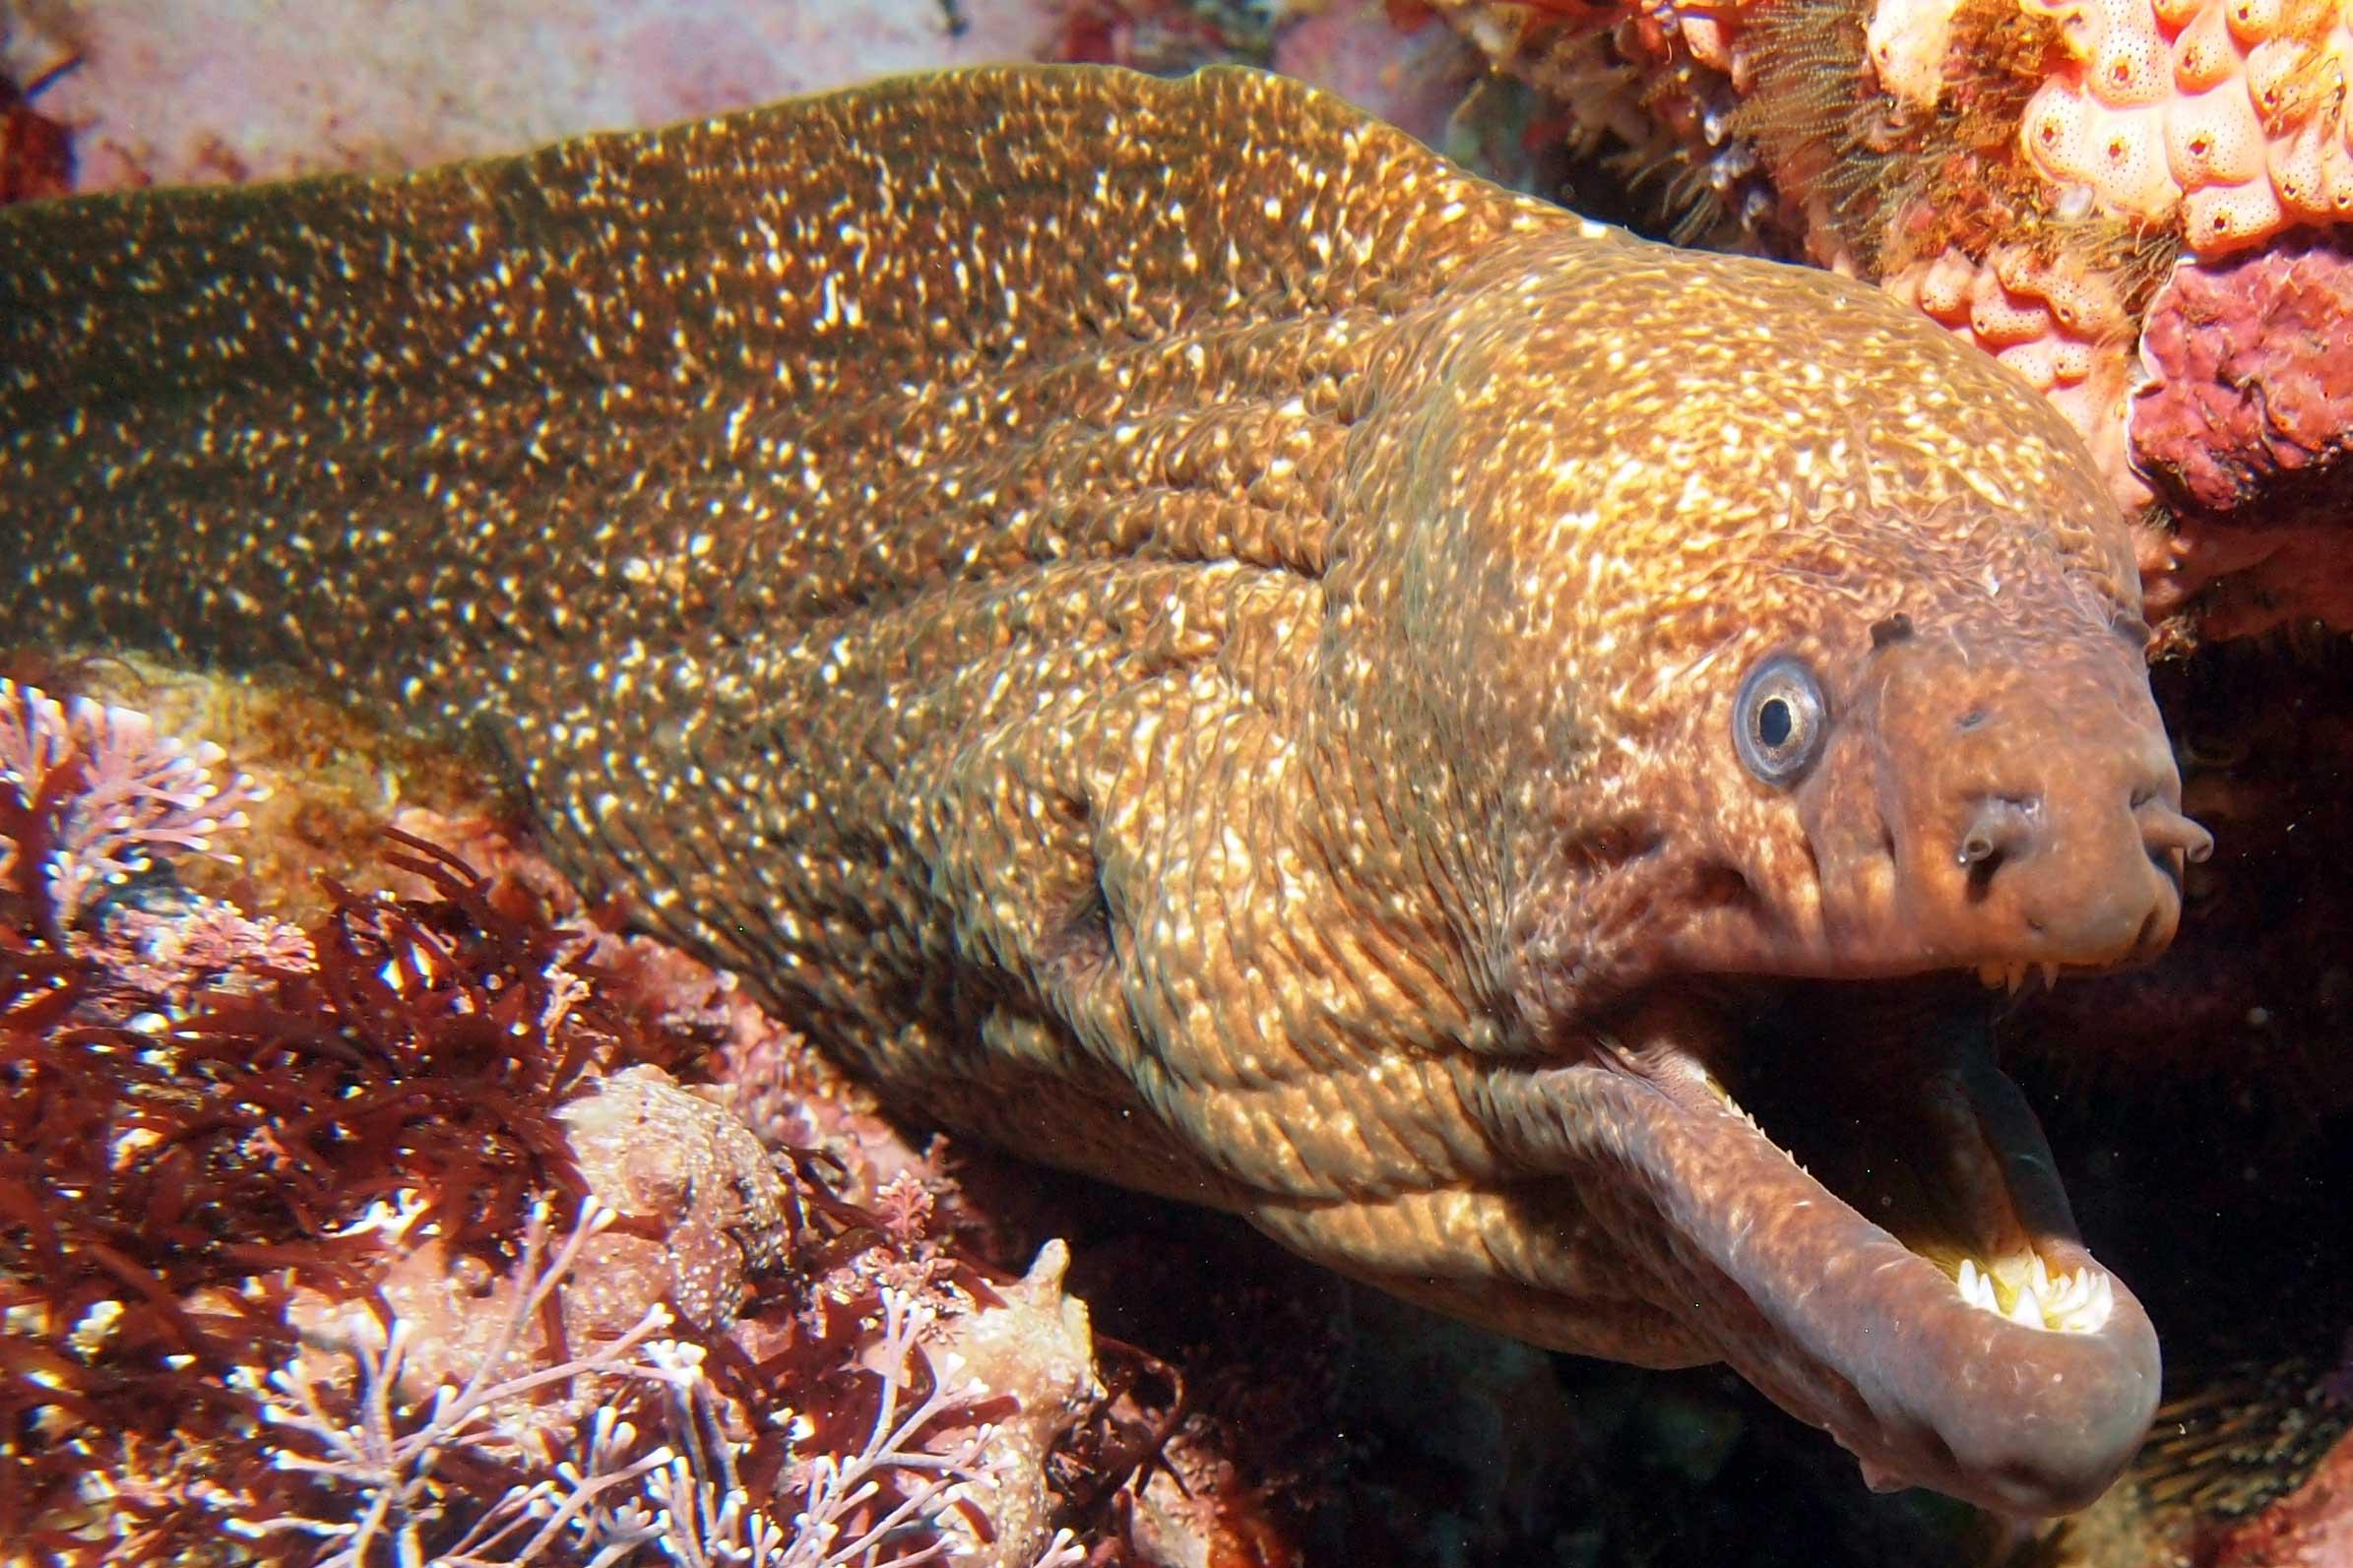 Speckled moray (Gymnothorax obesus)